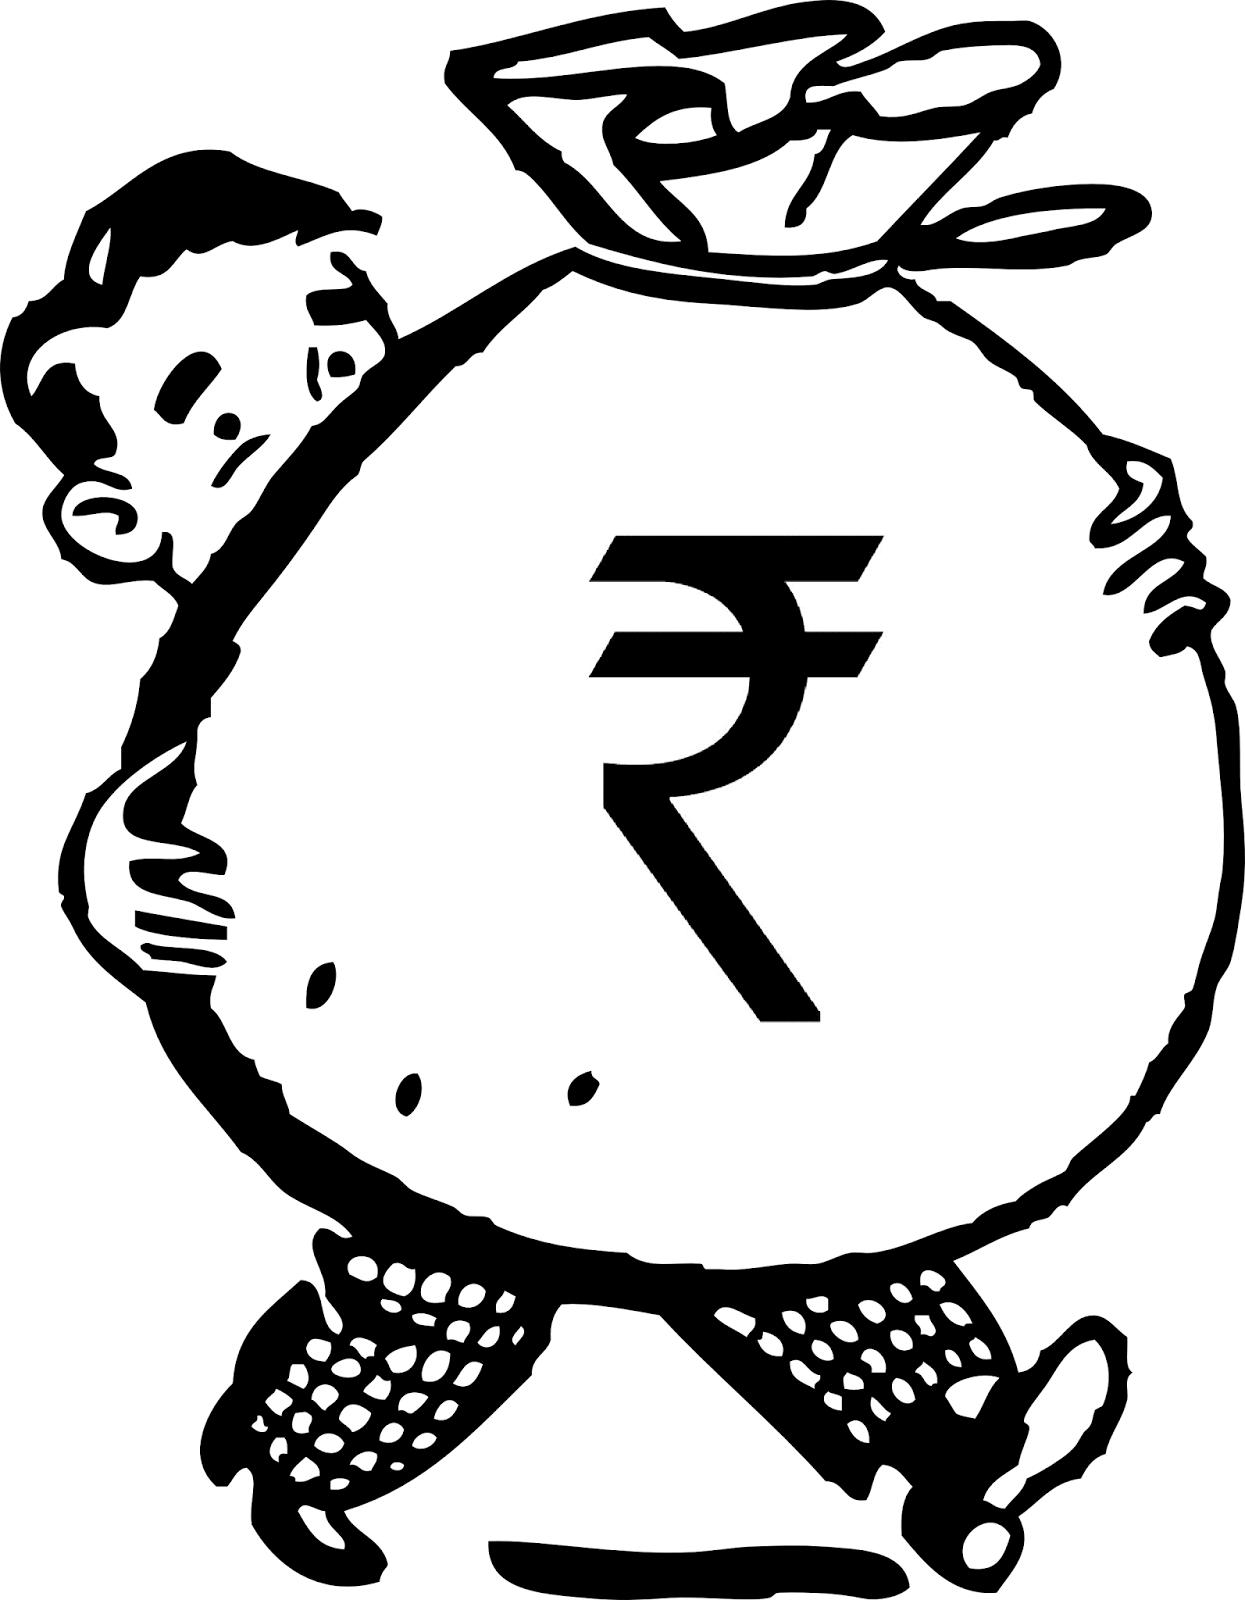 Rupee clipart.